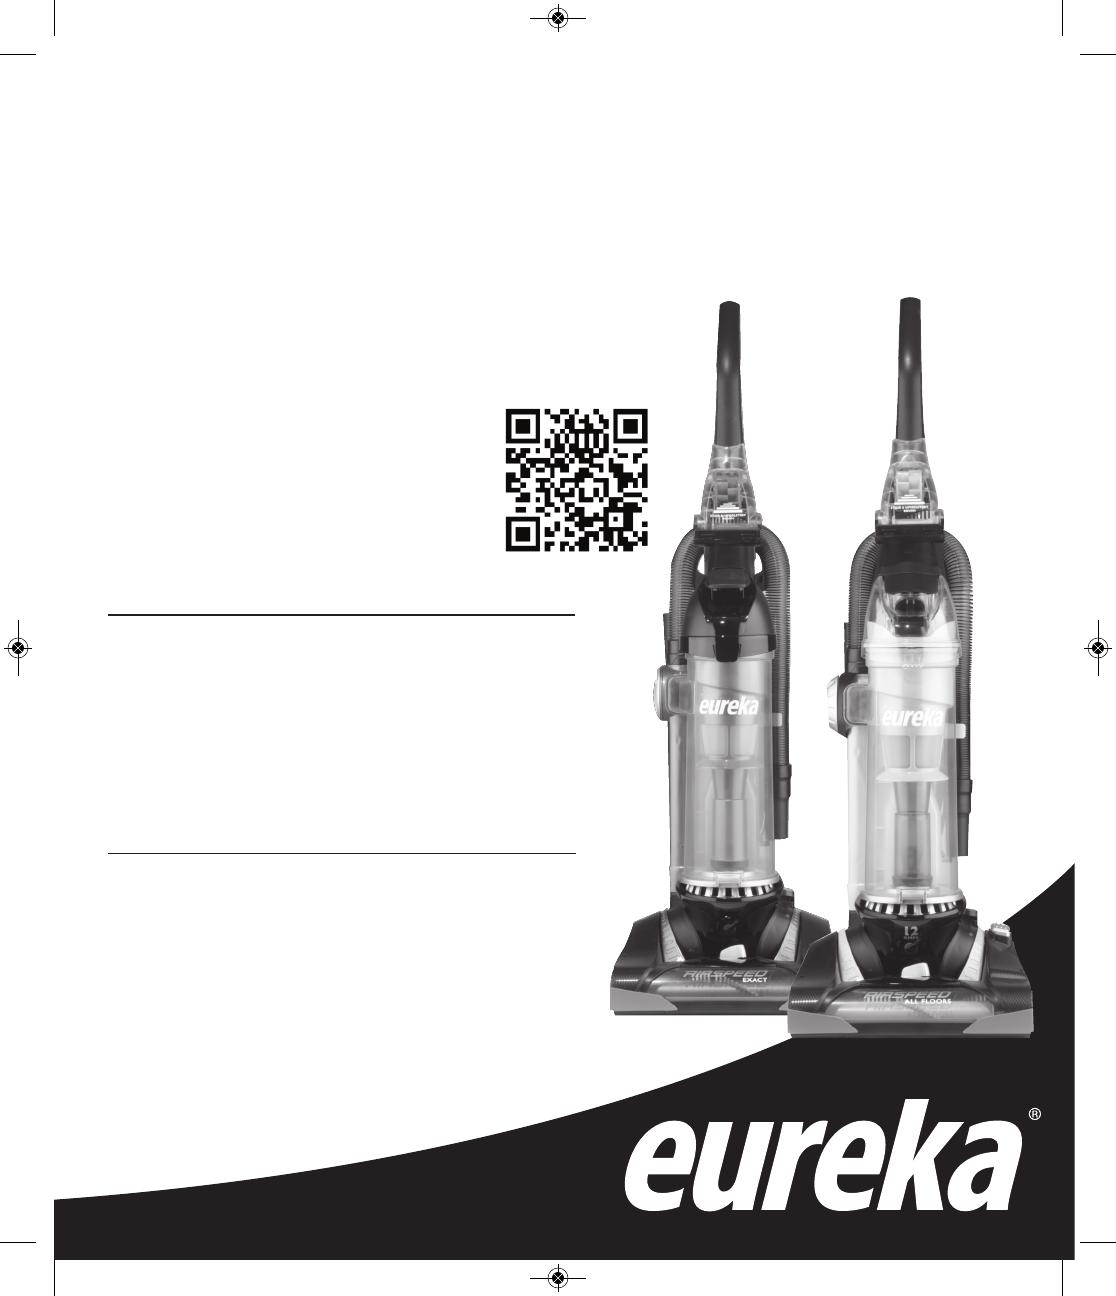 Eureka AS3001 AS3019 Series English User Manual To The